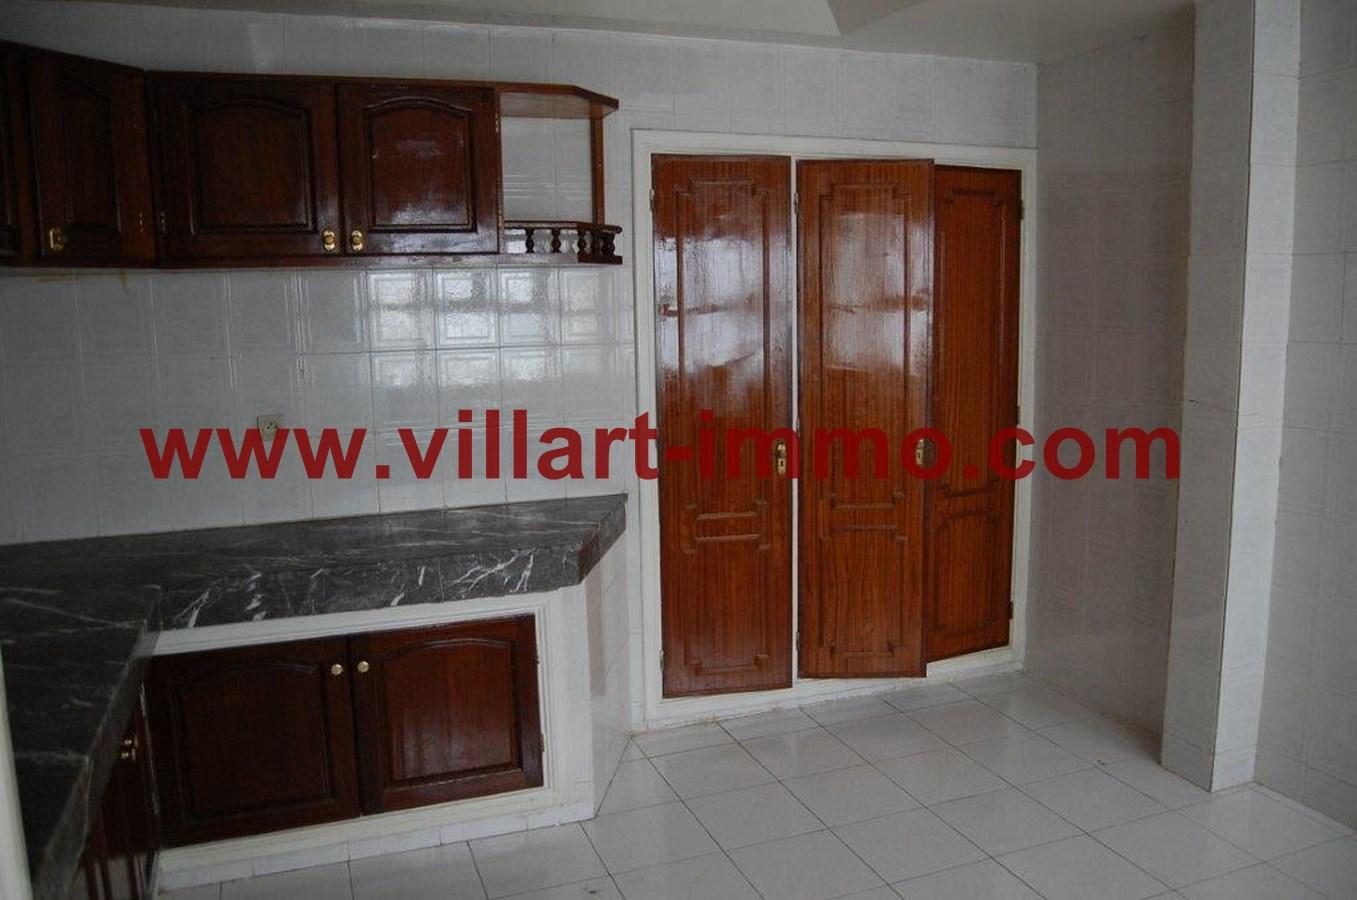 5-Location-Appartemnt-Non meublé-Tanger-Cuisine-L731-Villart-immo